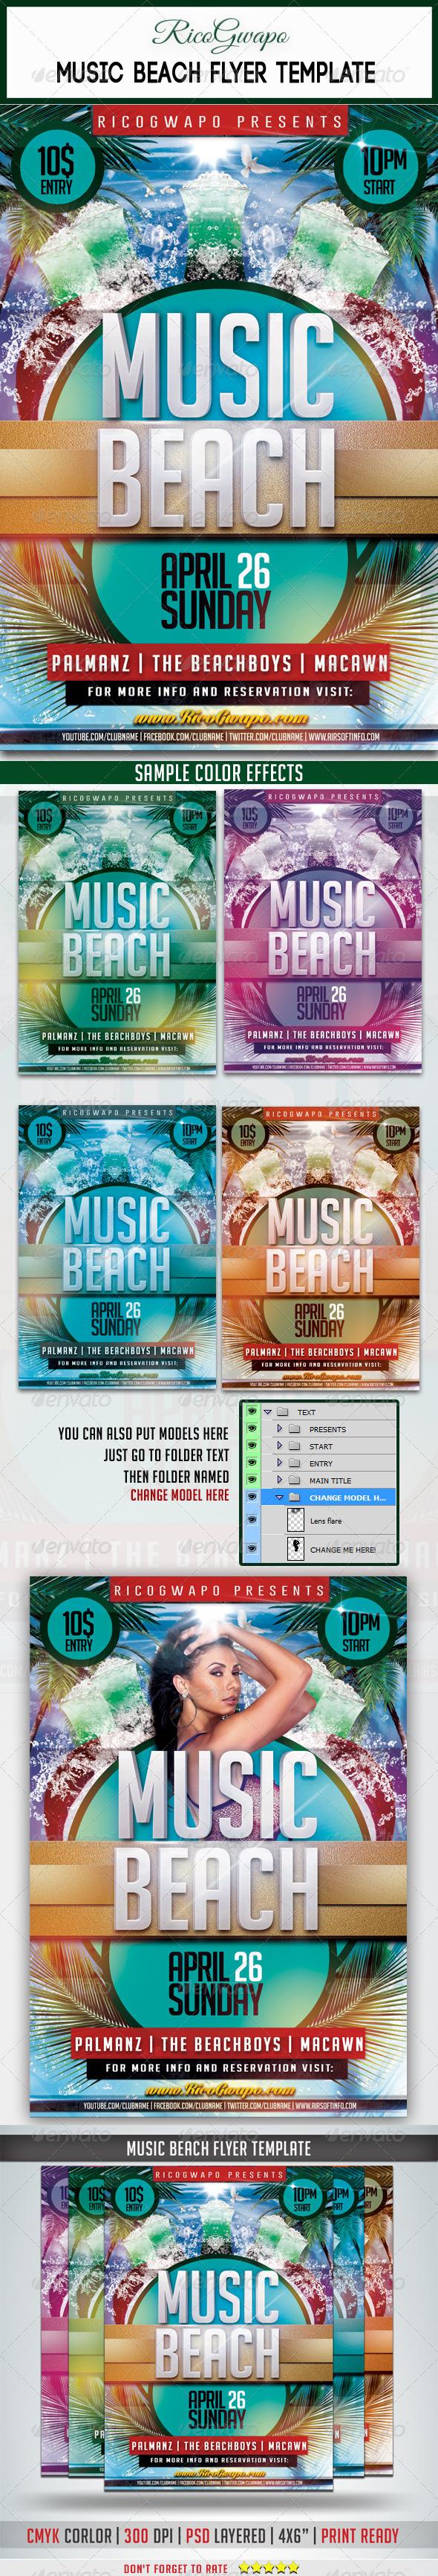 Music Beach Flyer Template - Flyers Print Templates